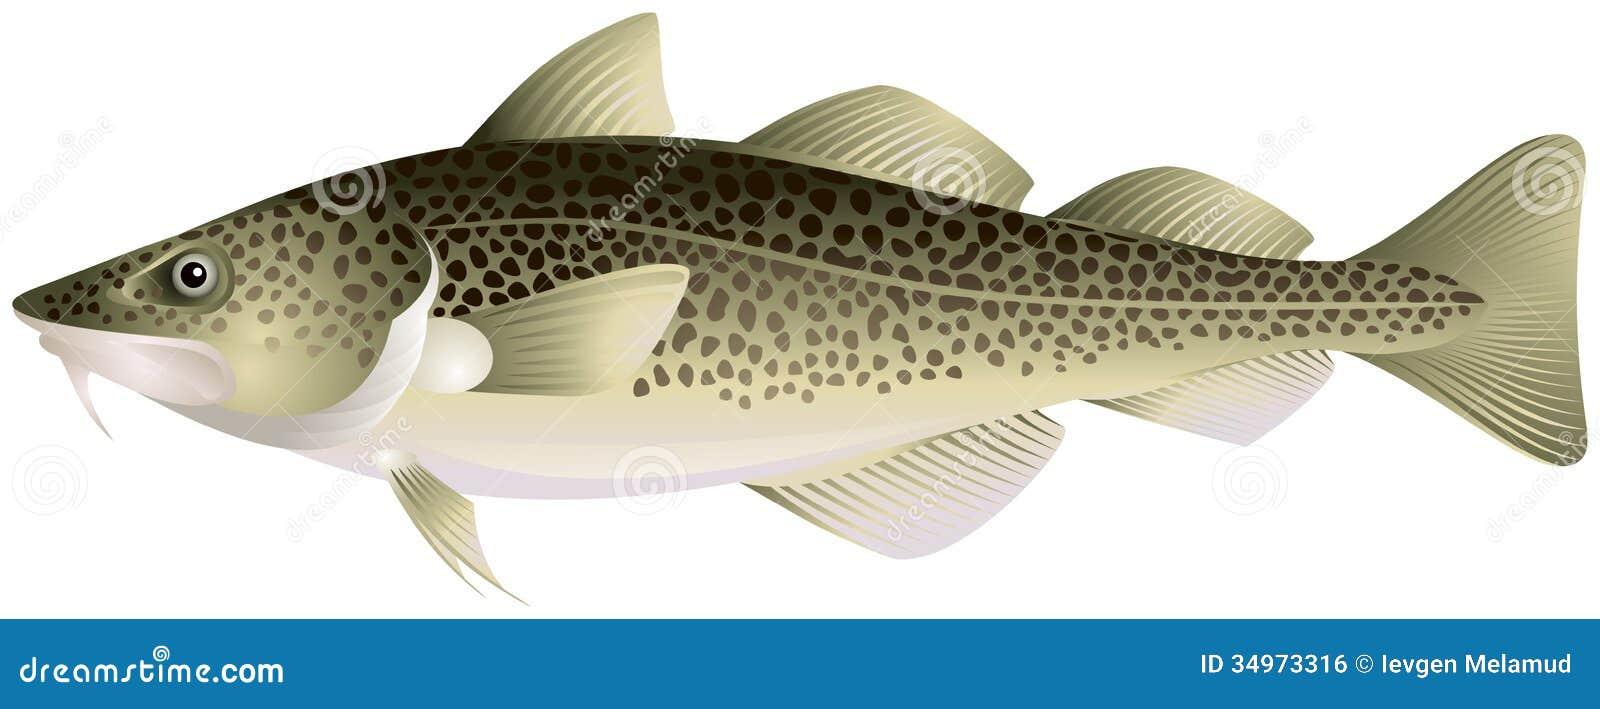 Atlantic cod royalty free stock image image 34973316 for Atlantic cod fish